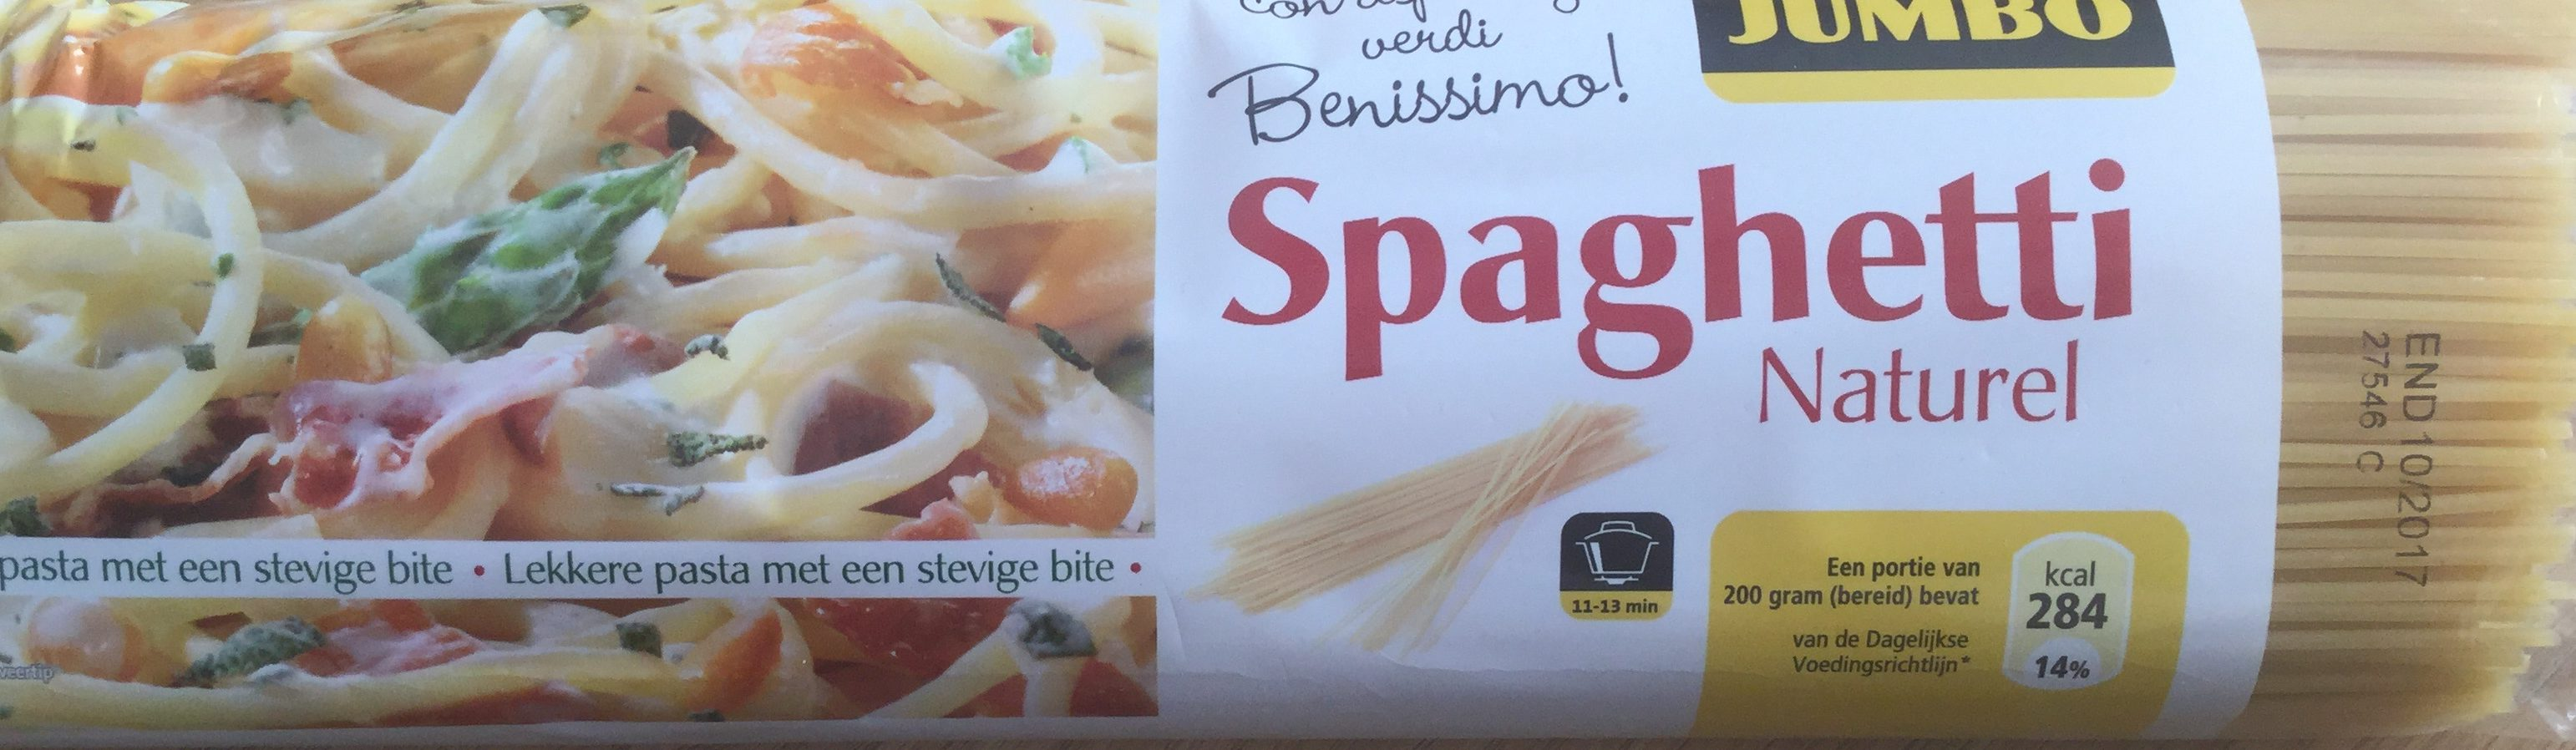 Spaghetti naturel - Product